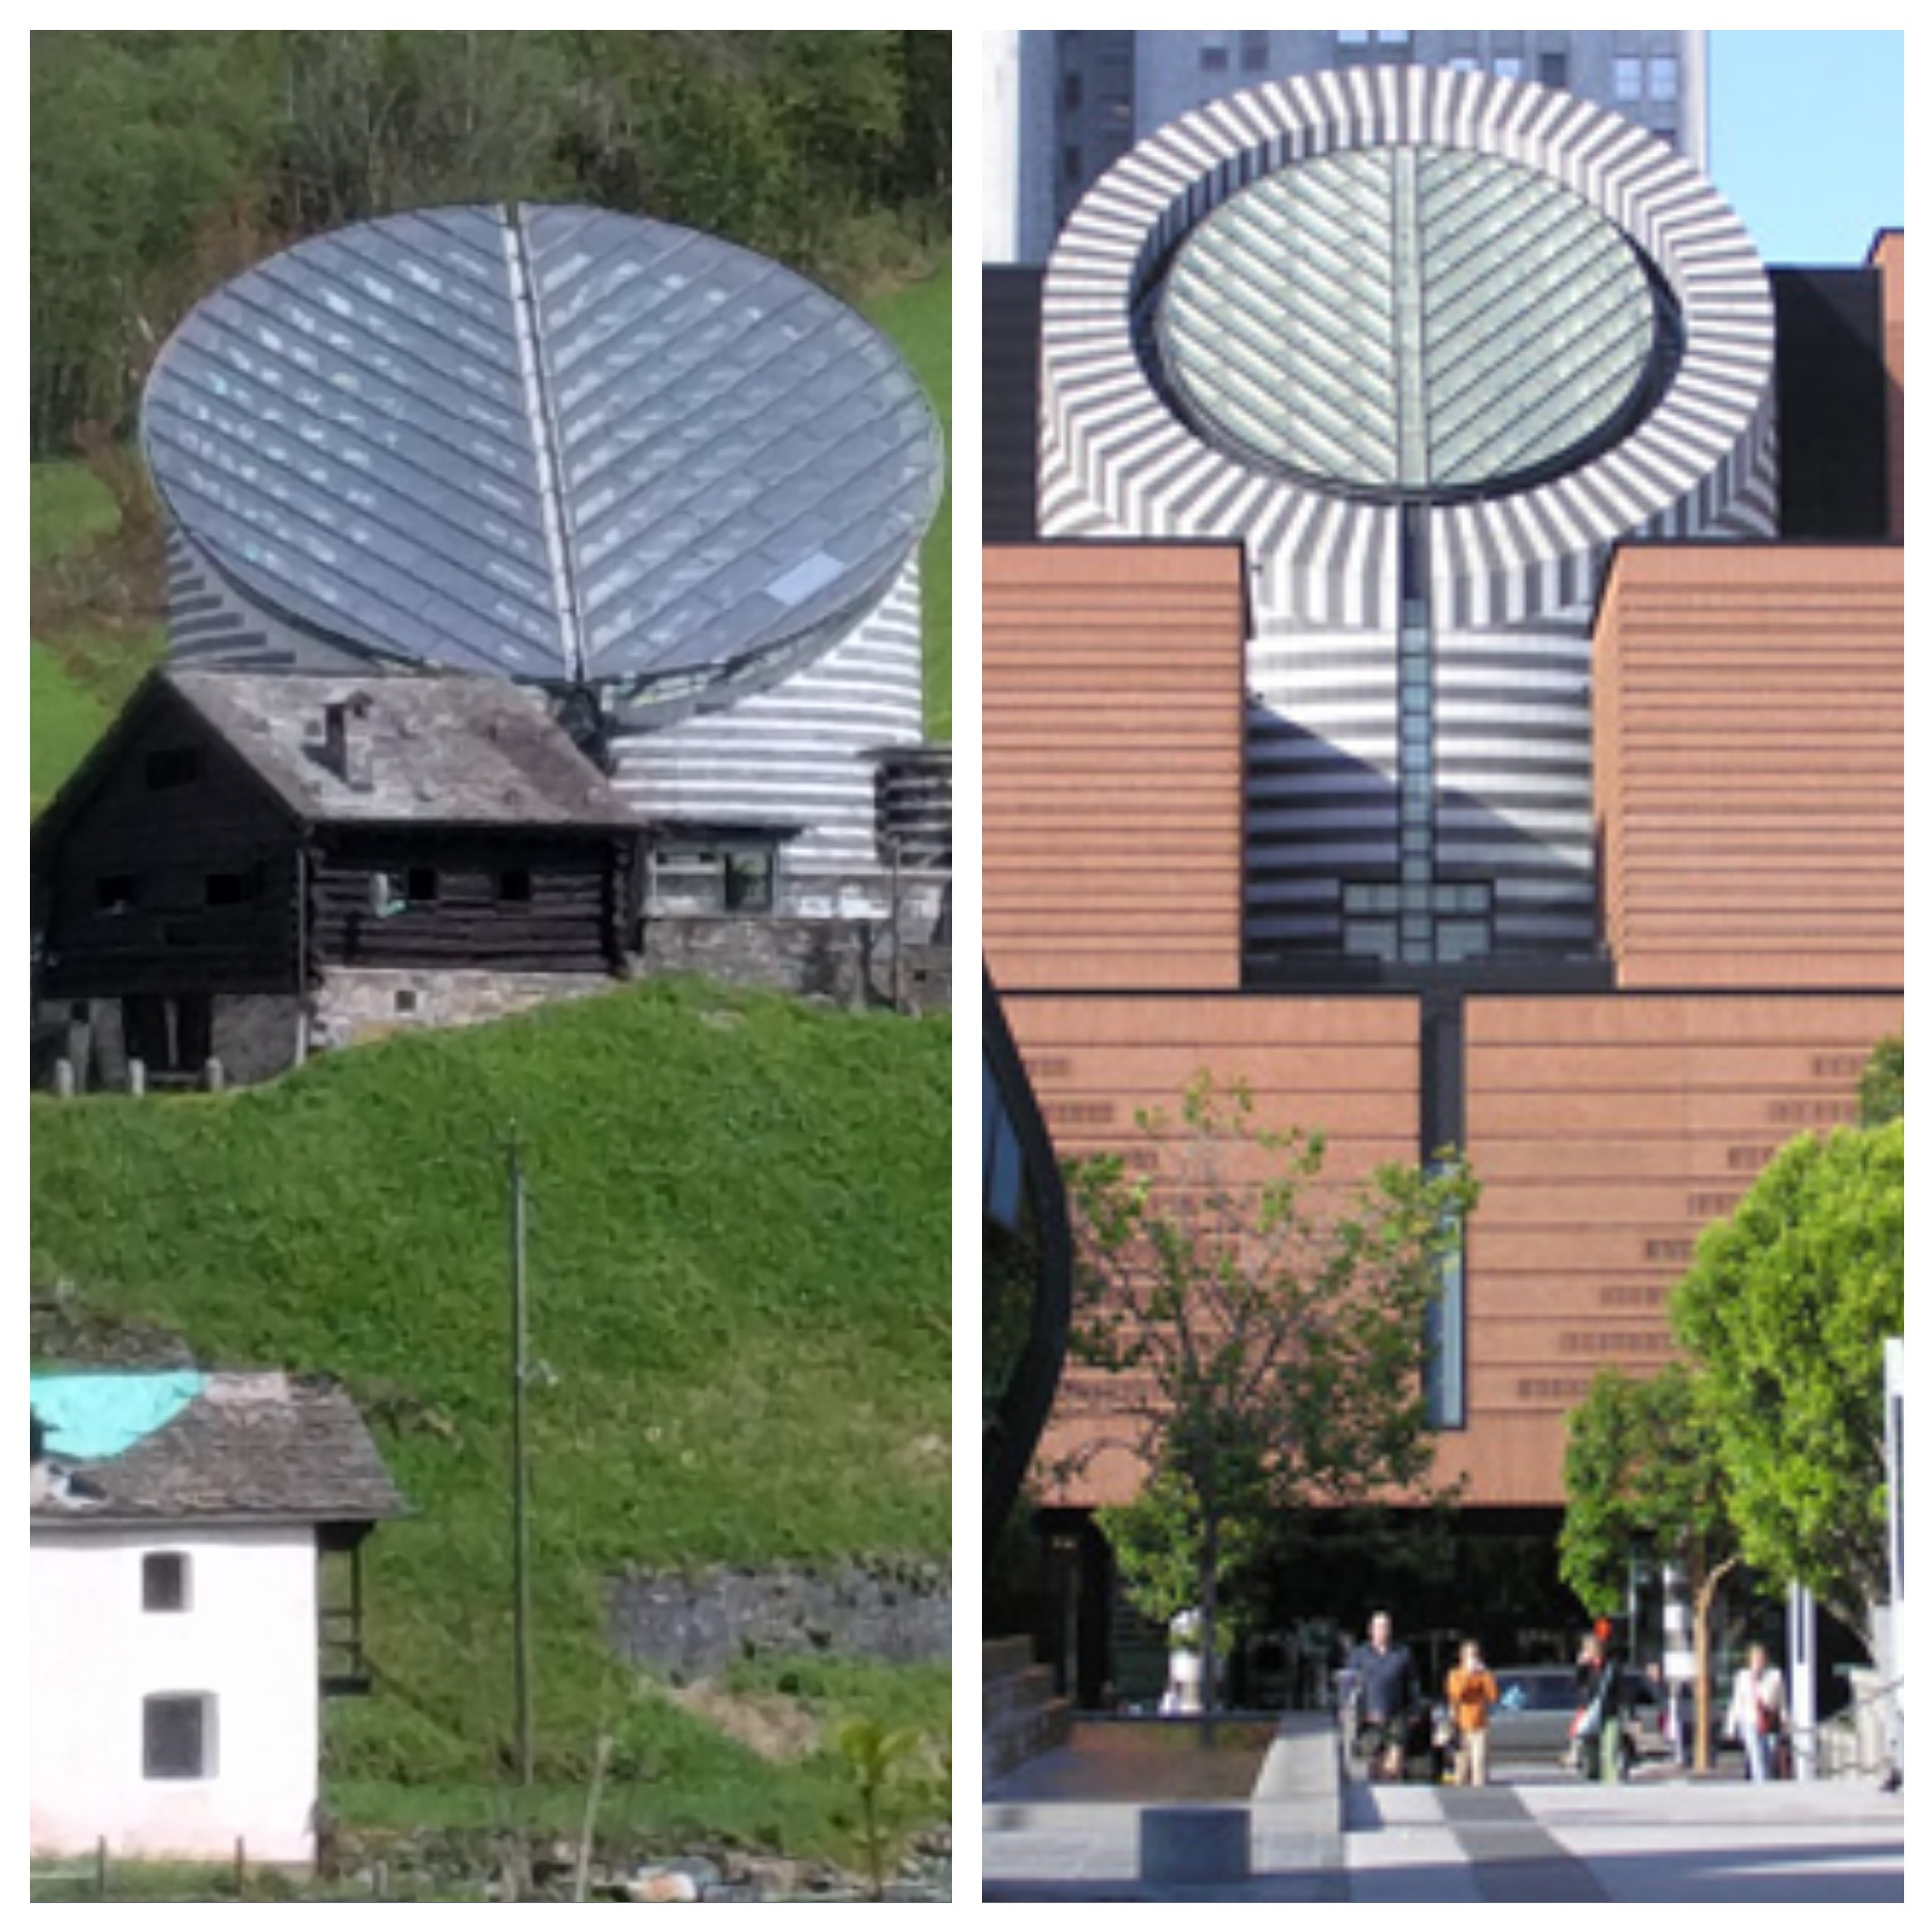 Left: Church of San Giovanni Battista, Mogna, Switzerland Right:San Francisco Museum of Modern Art